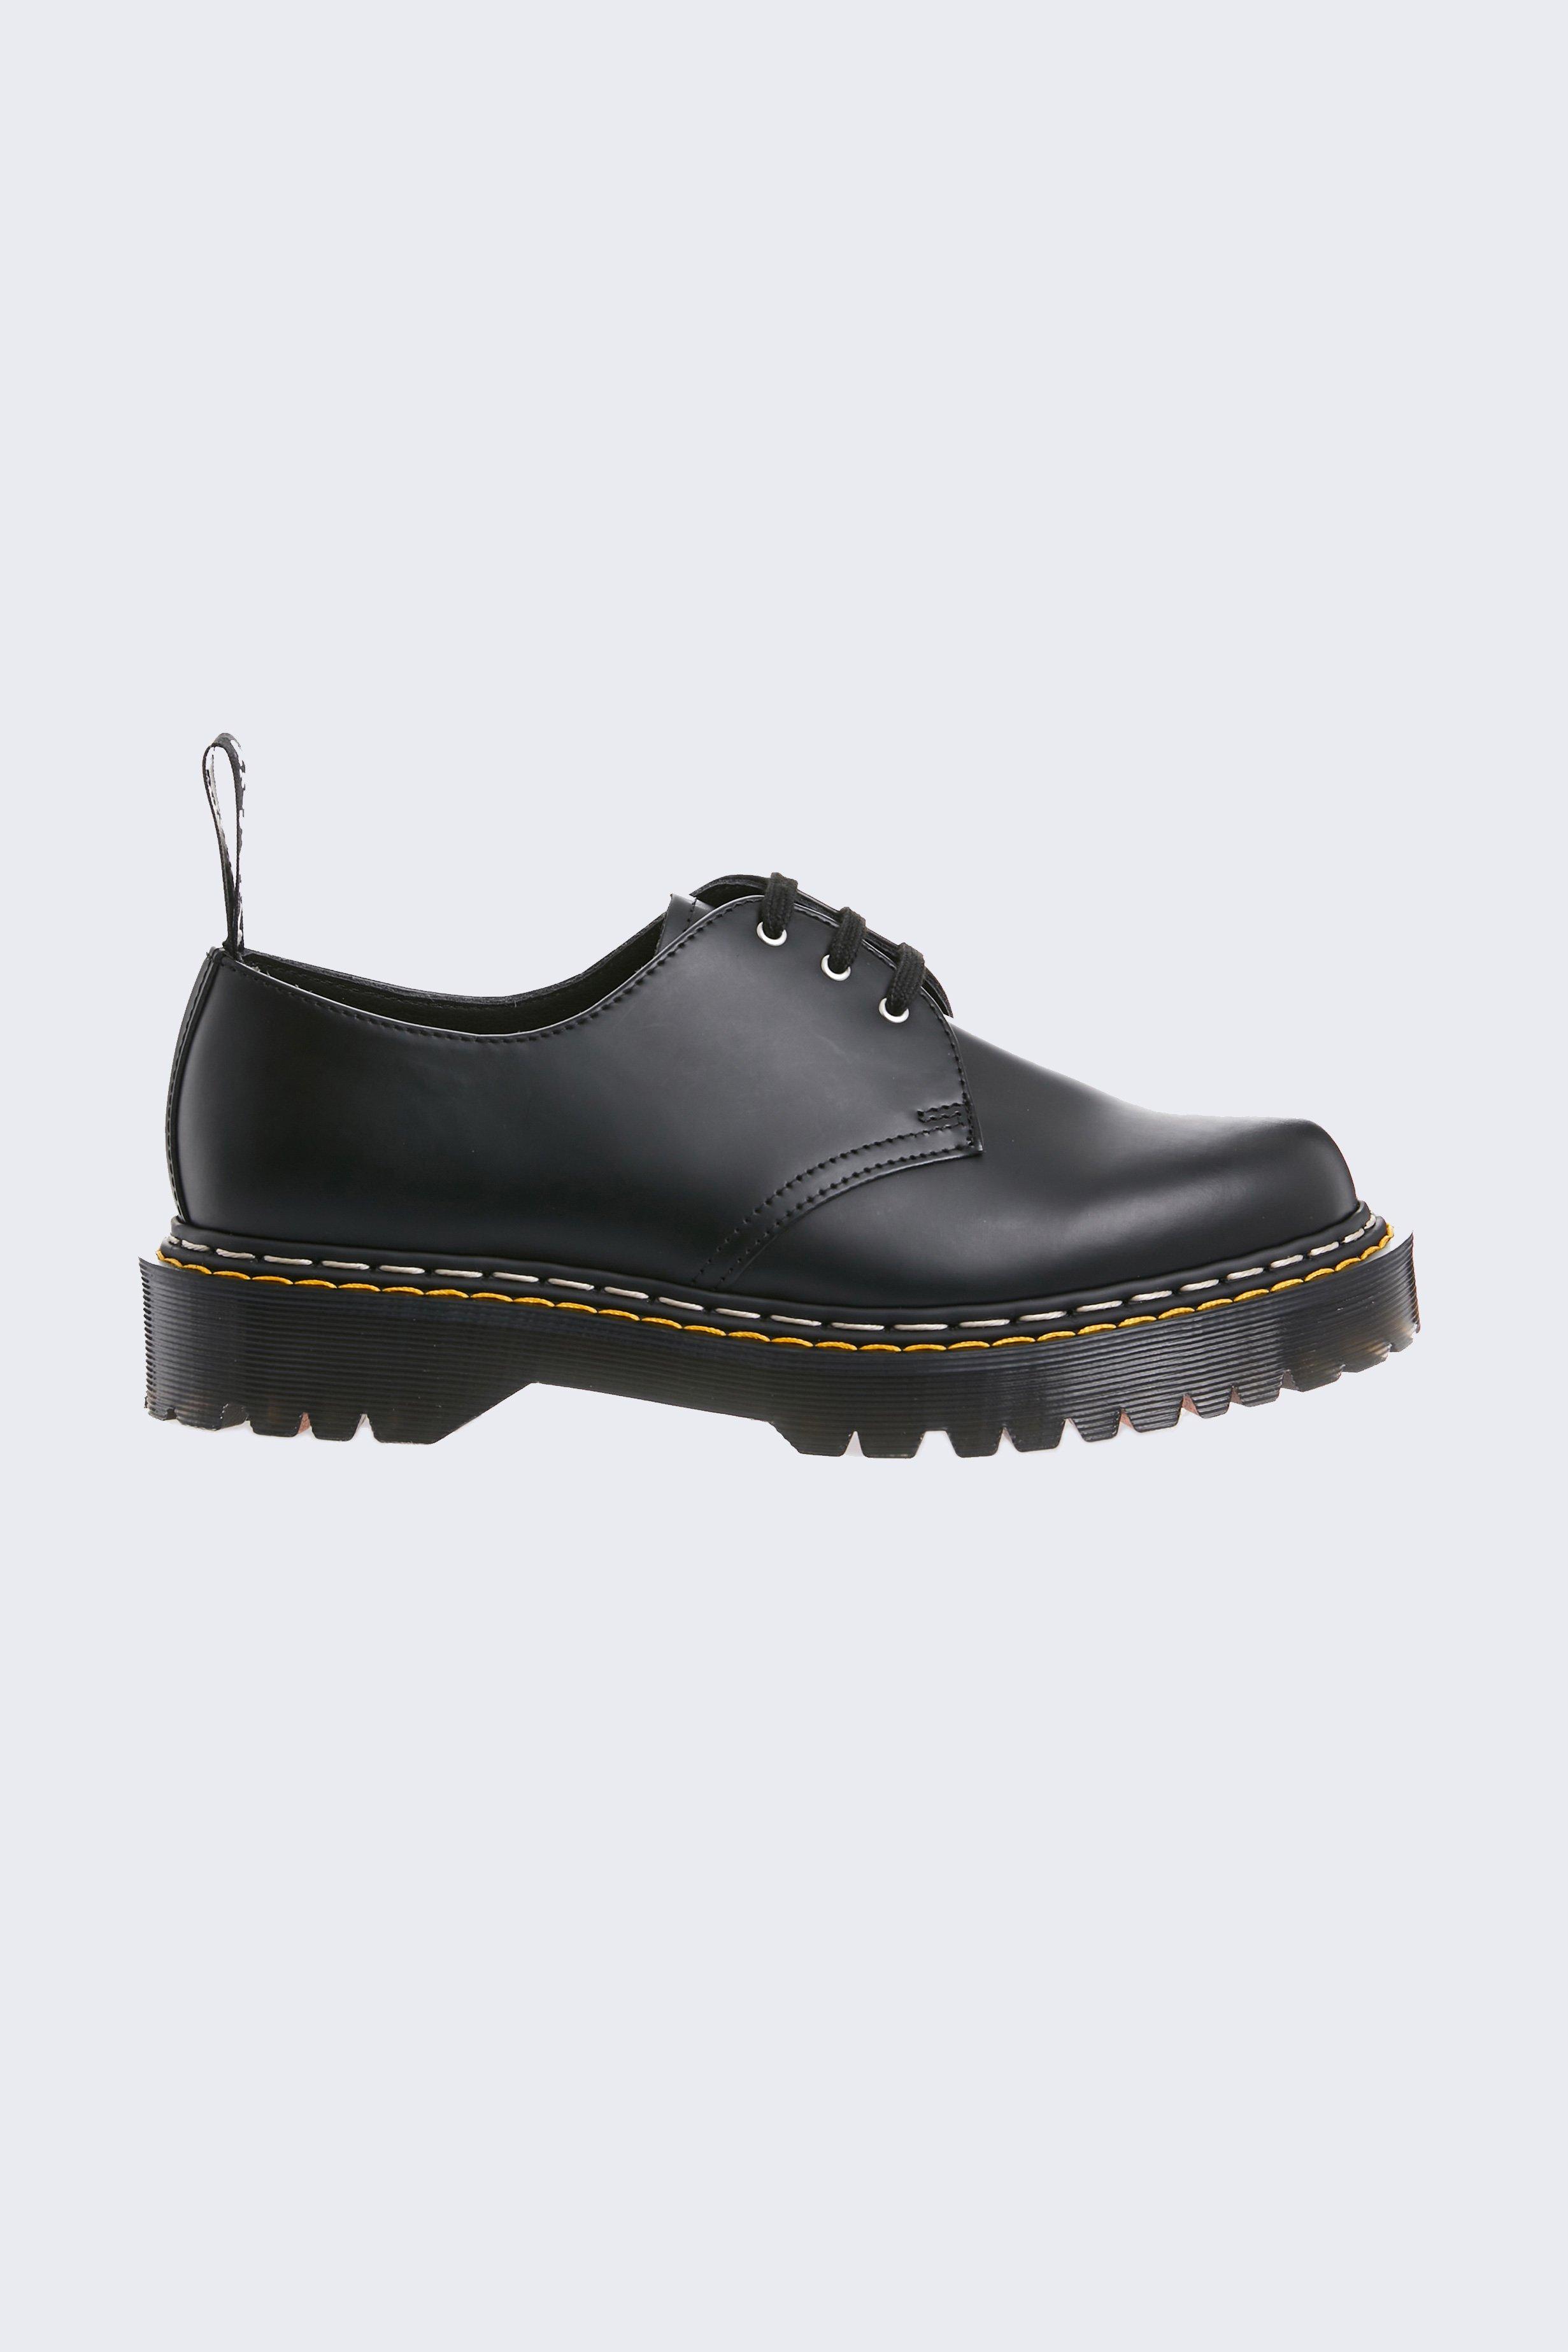 1461 Bex Sole Lace Up Shoes UK10